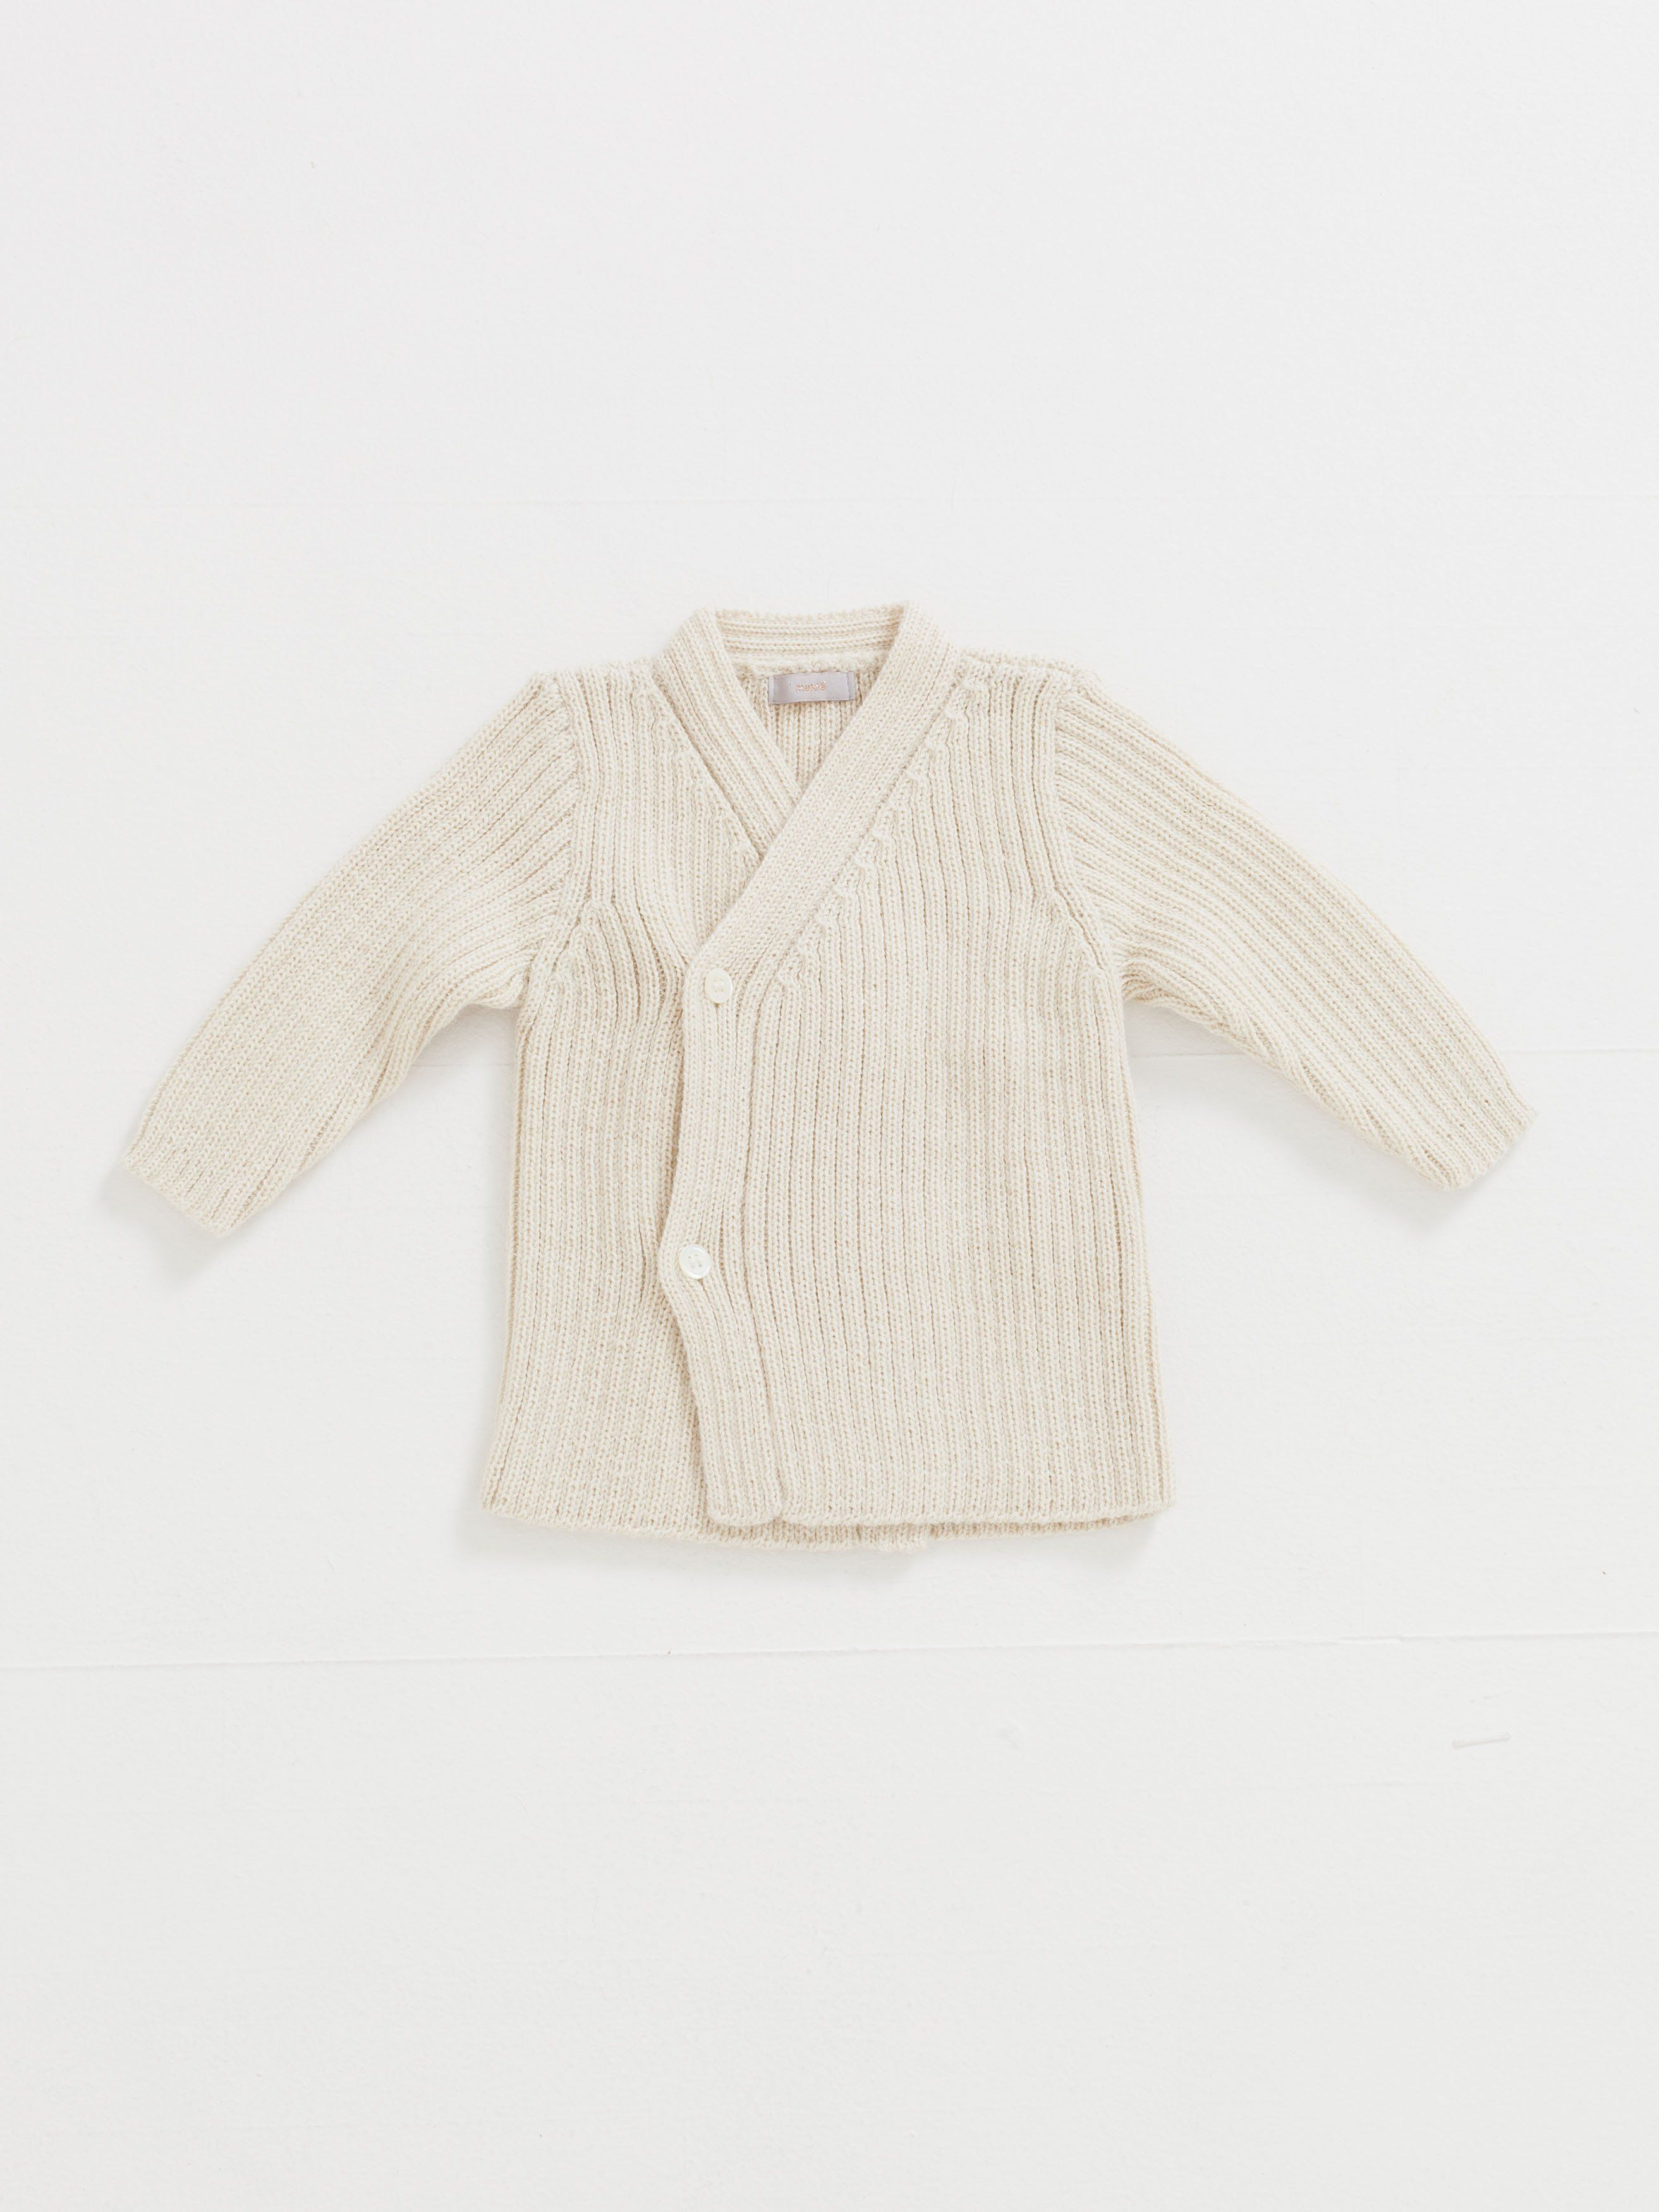 6e9bbb3f6921 Ivory Kimono Cardigan